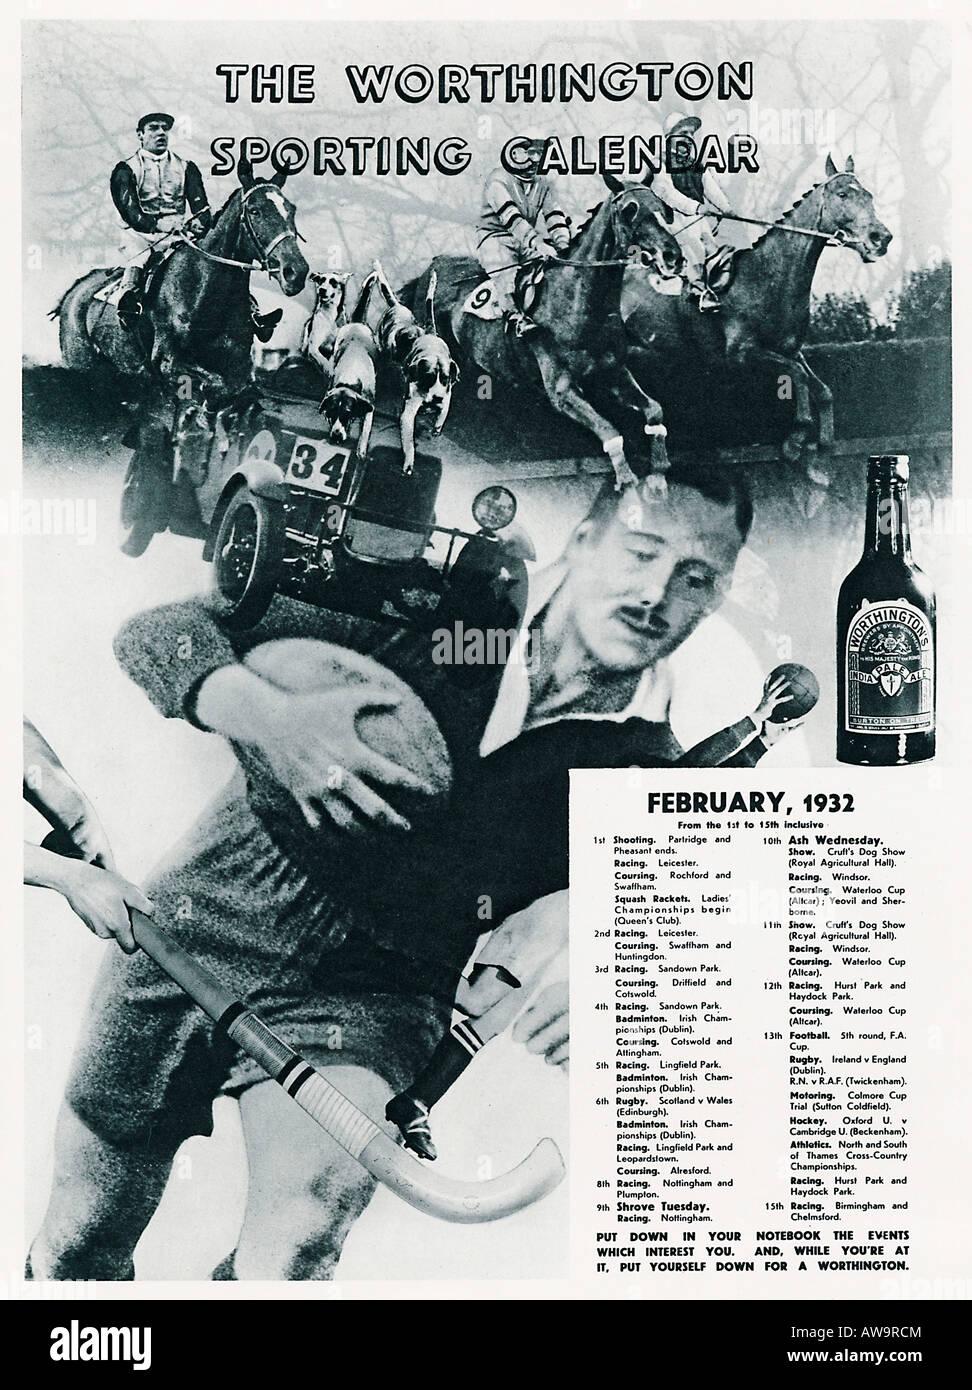 Grande Evento Calendario.Worthington Calendario Sportivo Feb 1932 Magazine Spot Per